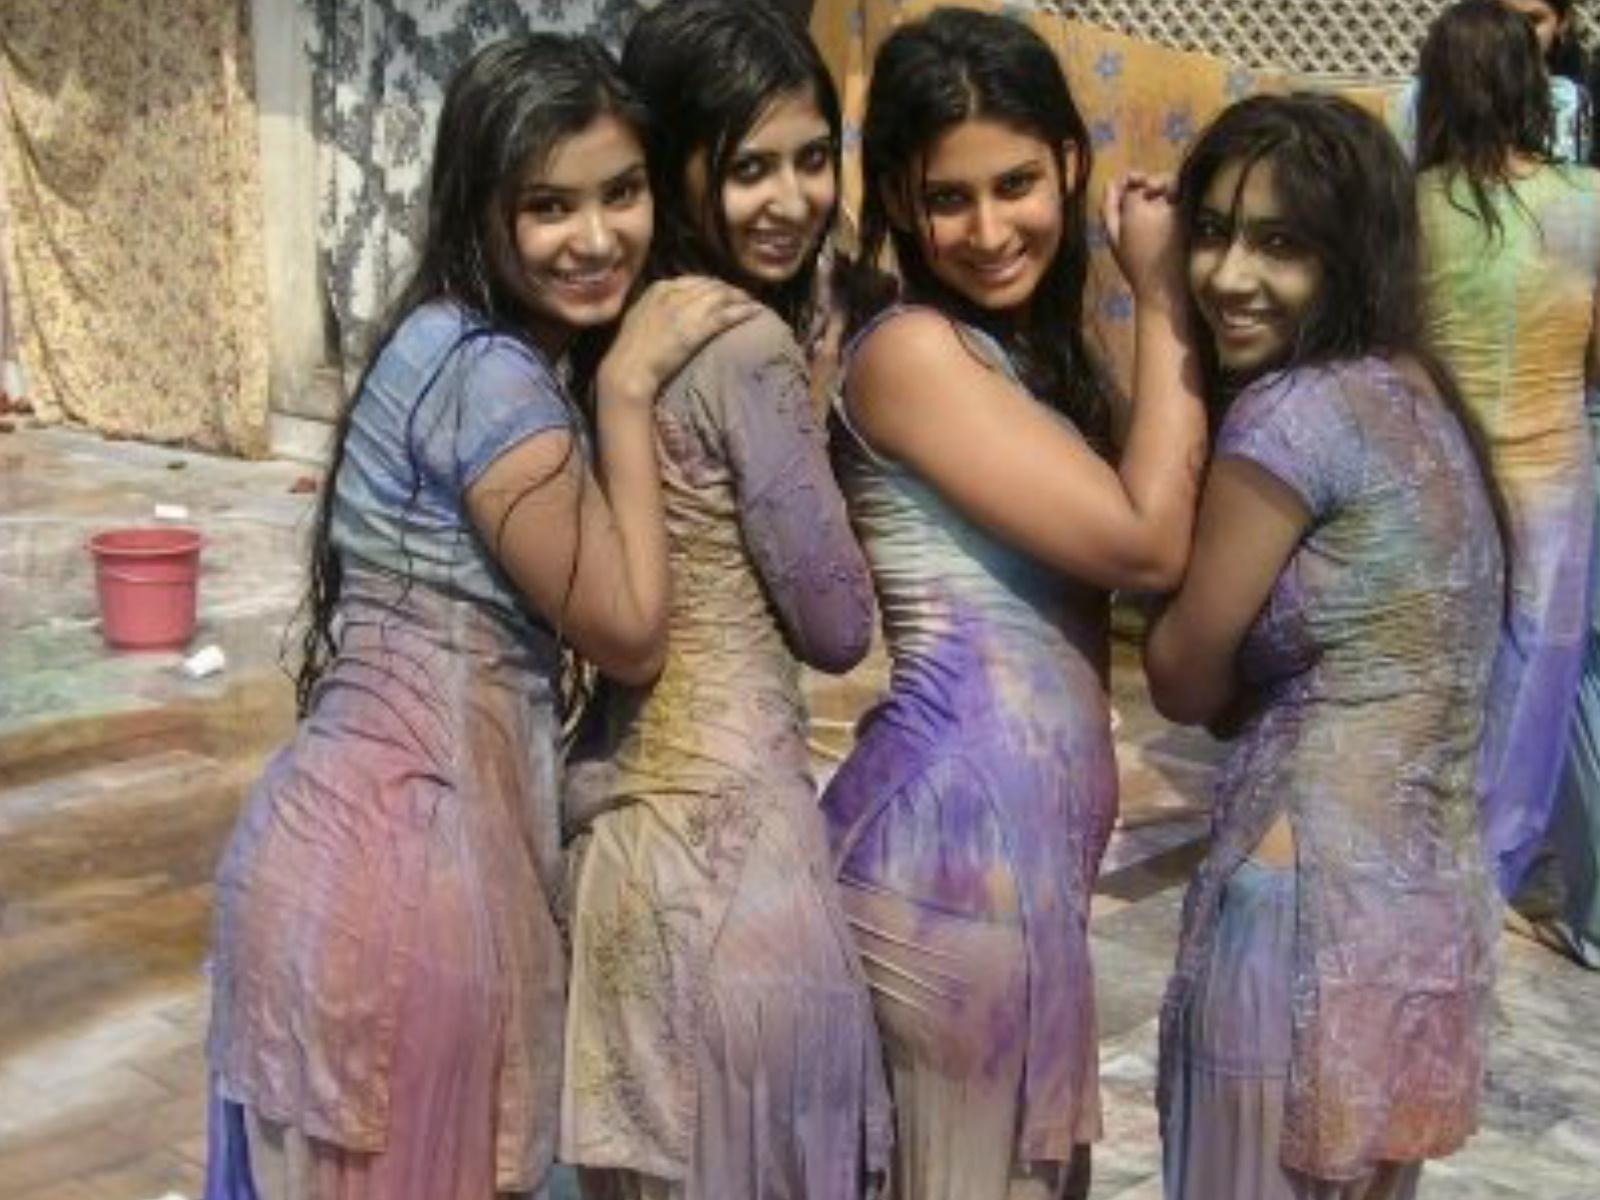 http://2.bp.blogspot.com/-wryUGueSOJY/TqeogNqFWQI/AAAAAAAADz8/rXVIxTn10t8/s1600/lahoreLumscollege-university-karachi-peshawar-local-hot-sexy-girls-wallpapers-photos-images+%252810%2529.jpg